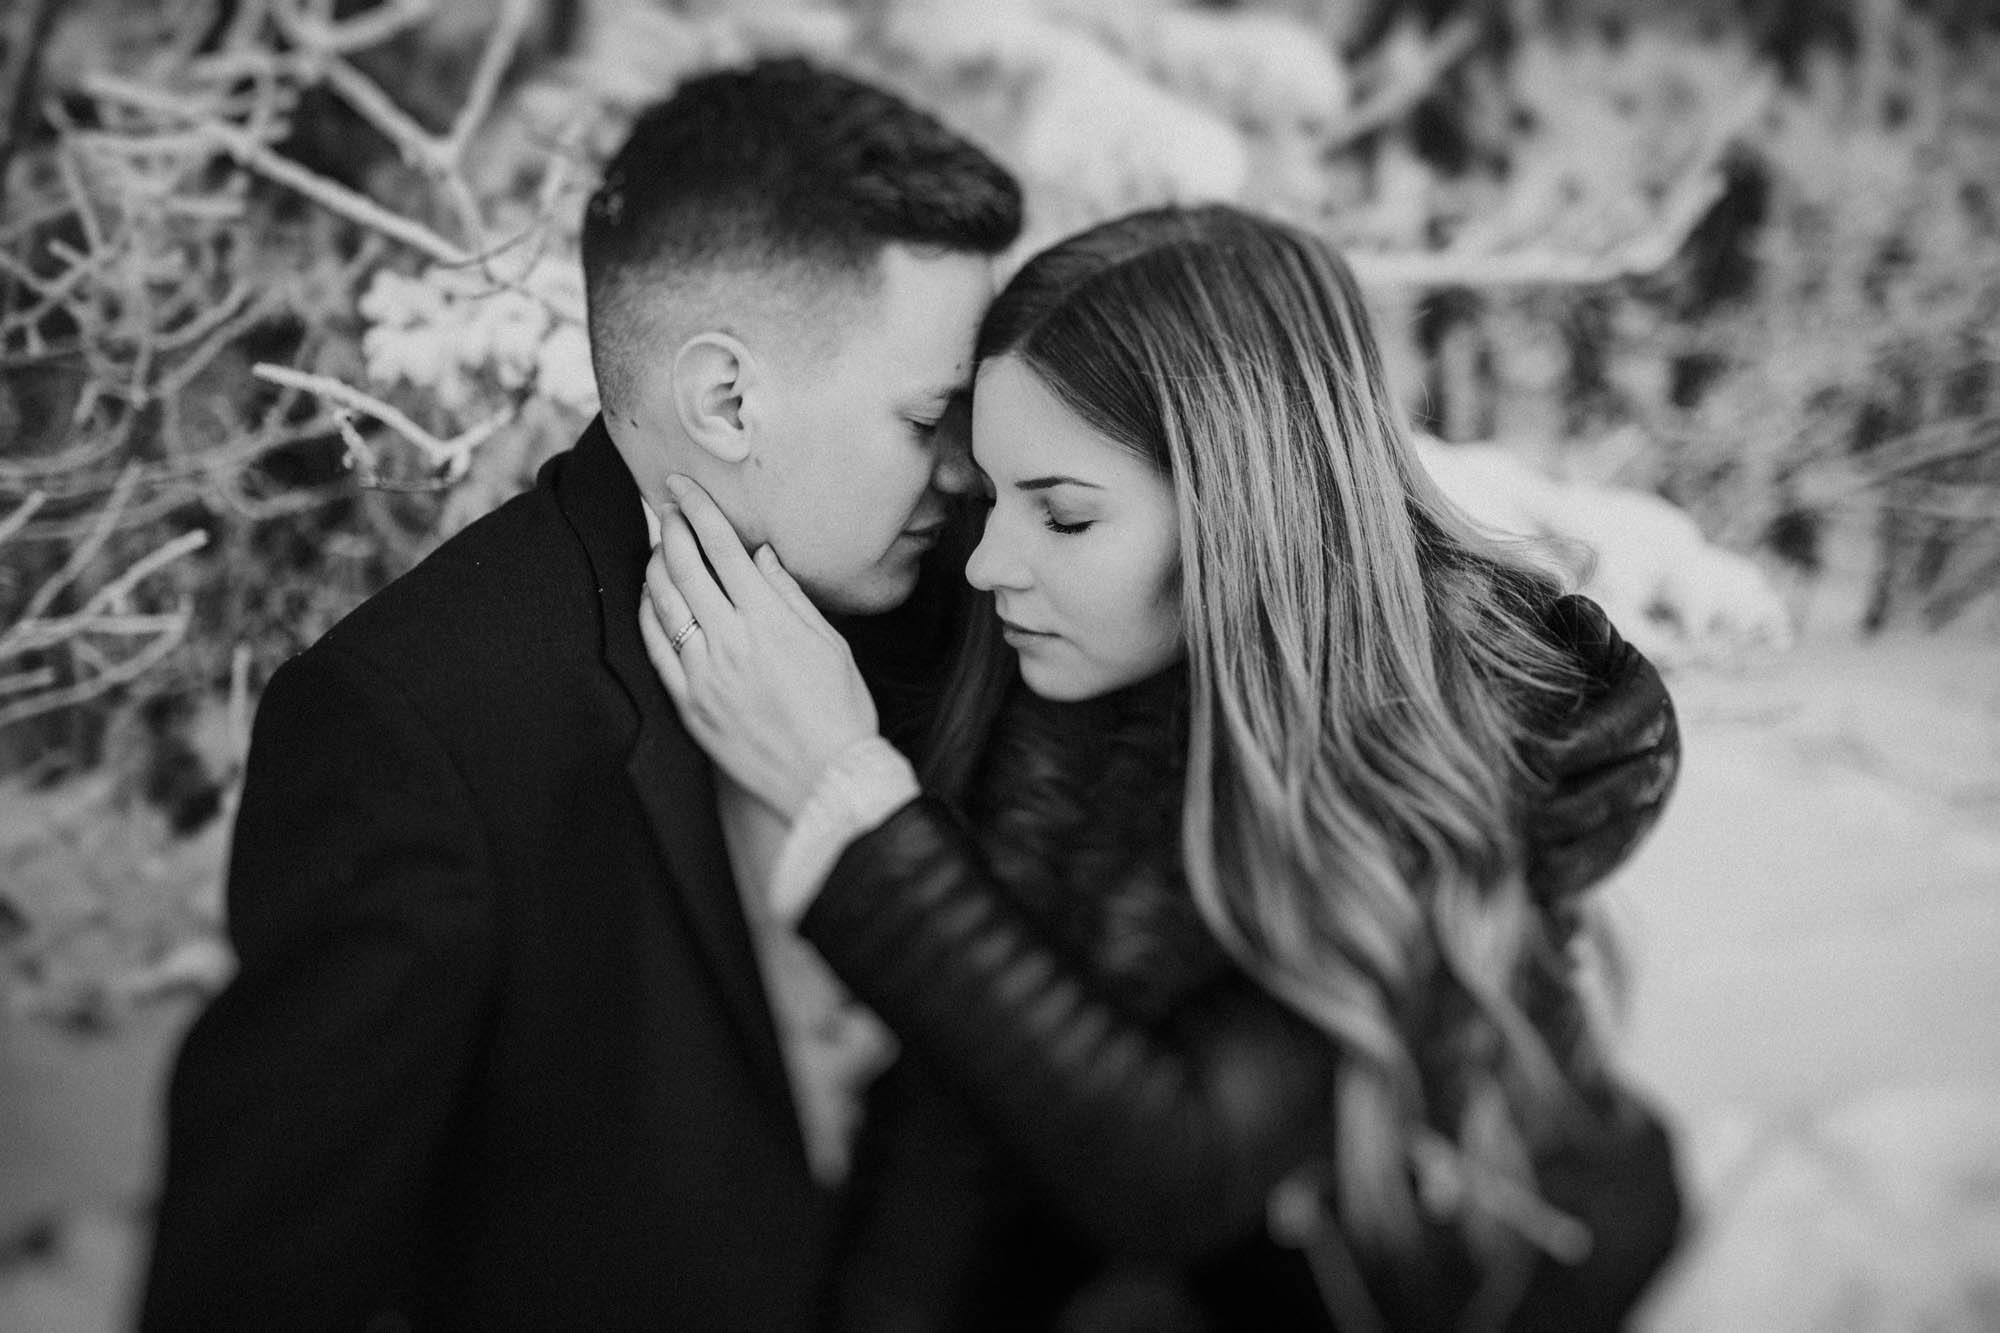 ashley_schulman_photography-winter_wedding_tampere-60.jpg